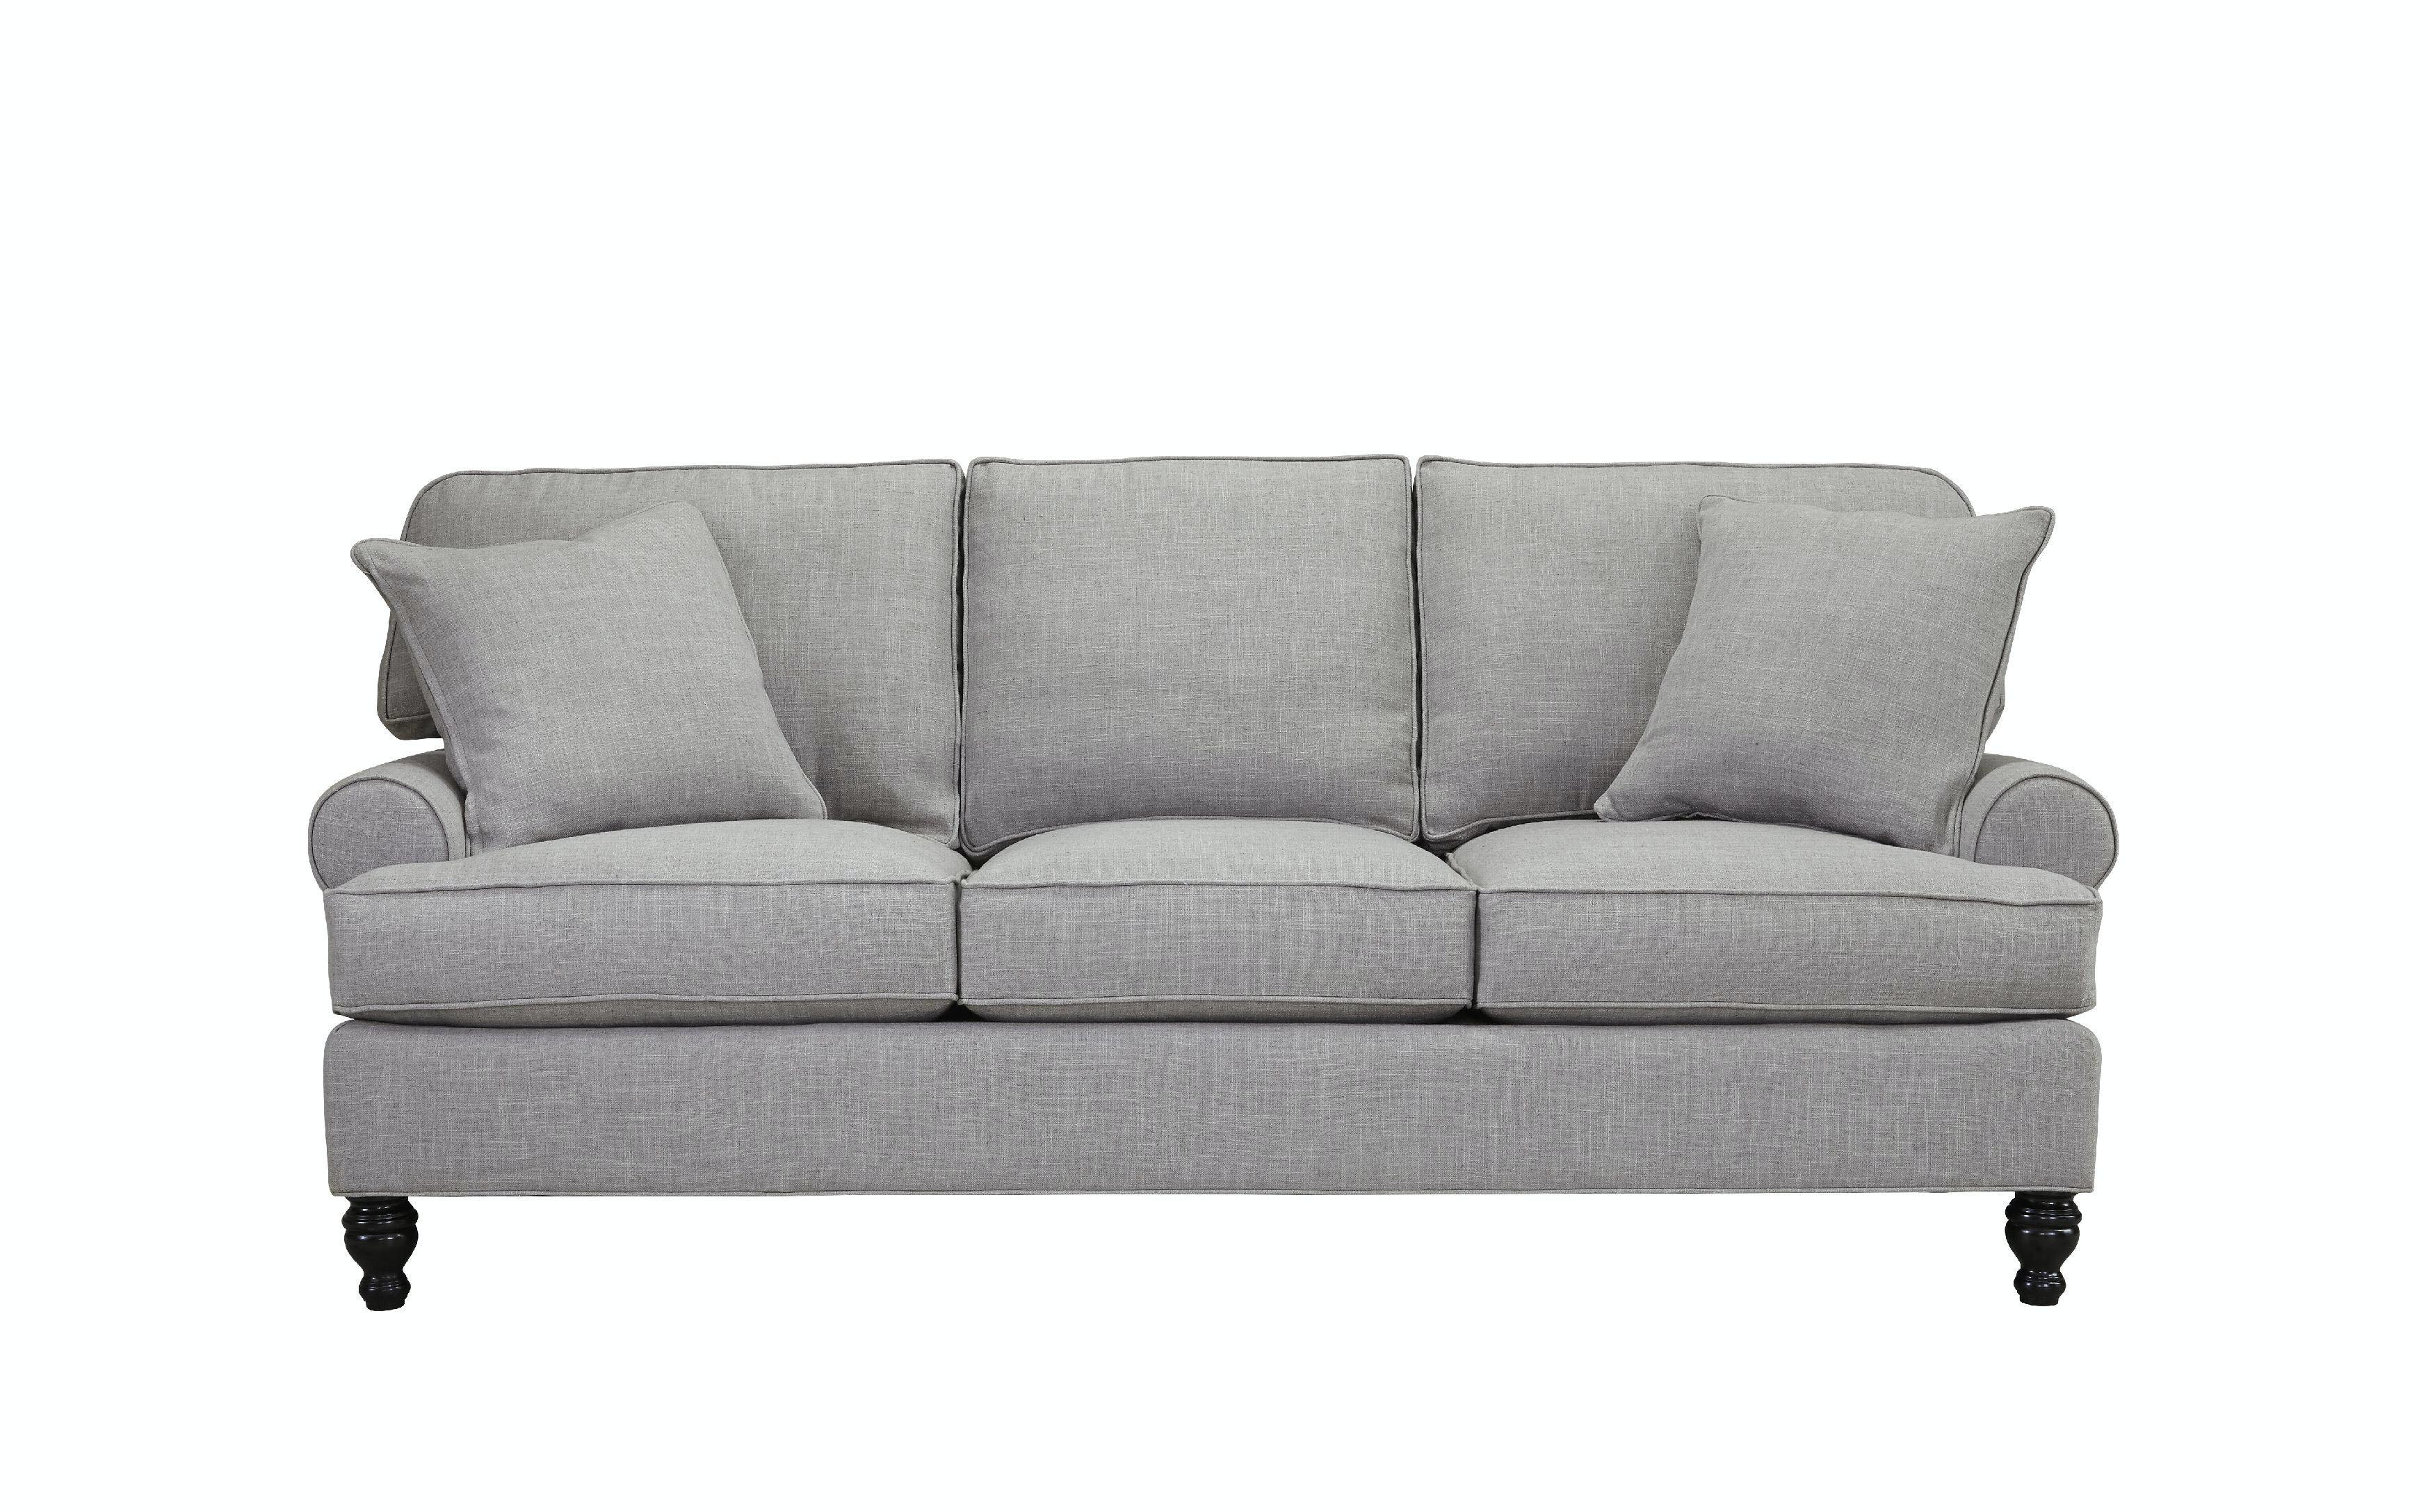 Southern Furniture 26961 Elena 7ft Sofa